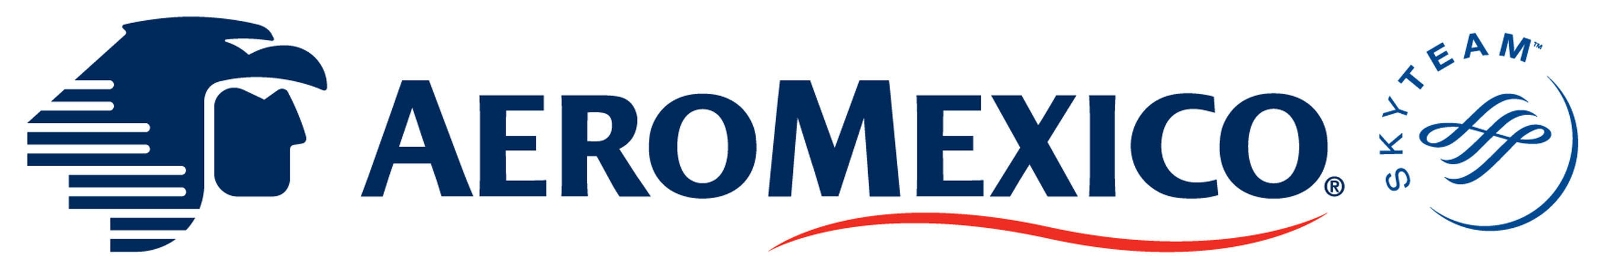 Aeromexico - Aeromexico Logo PNG